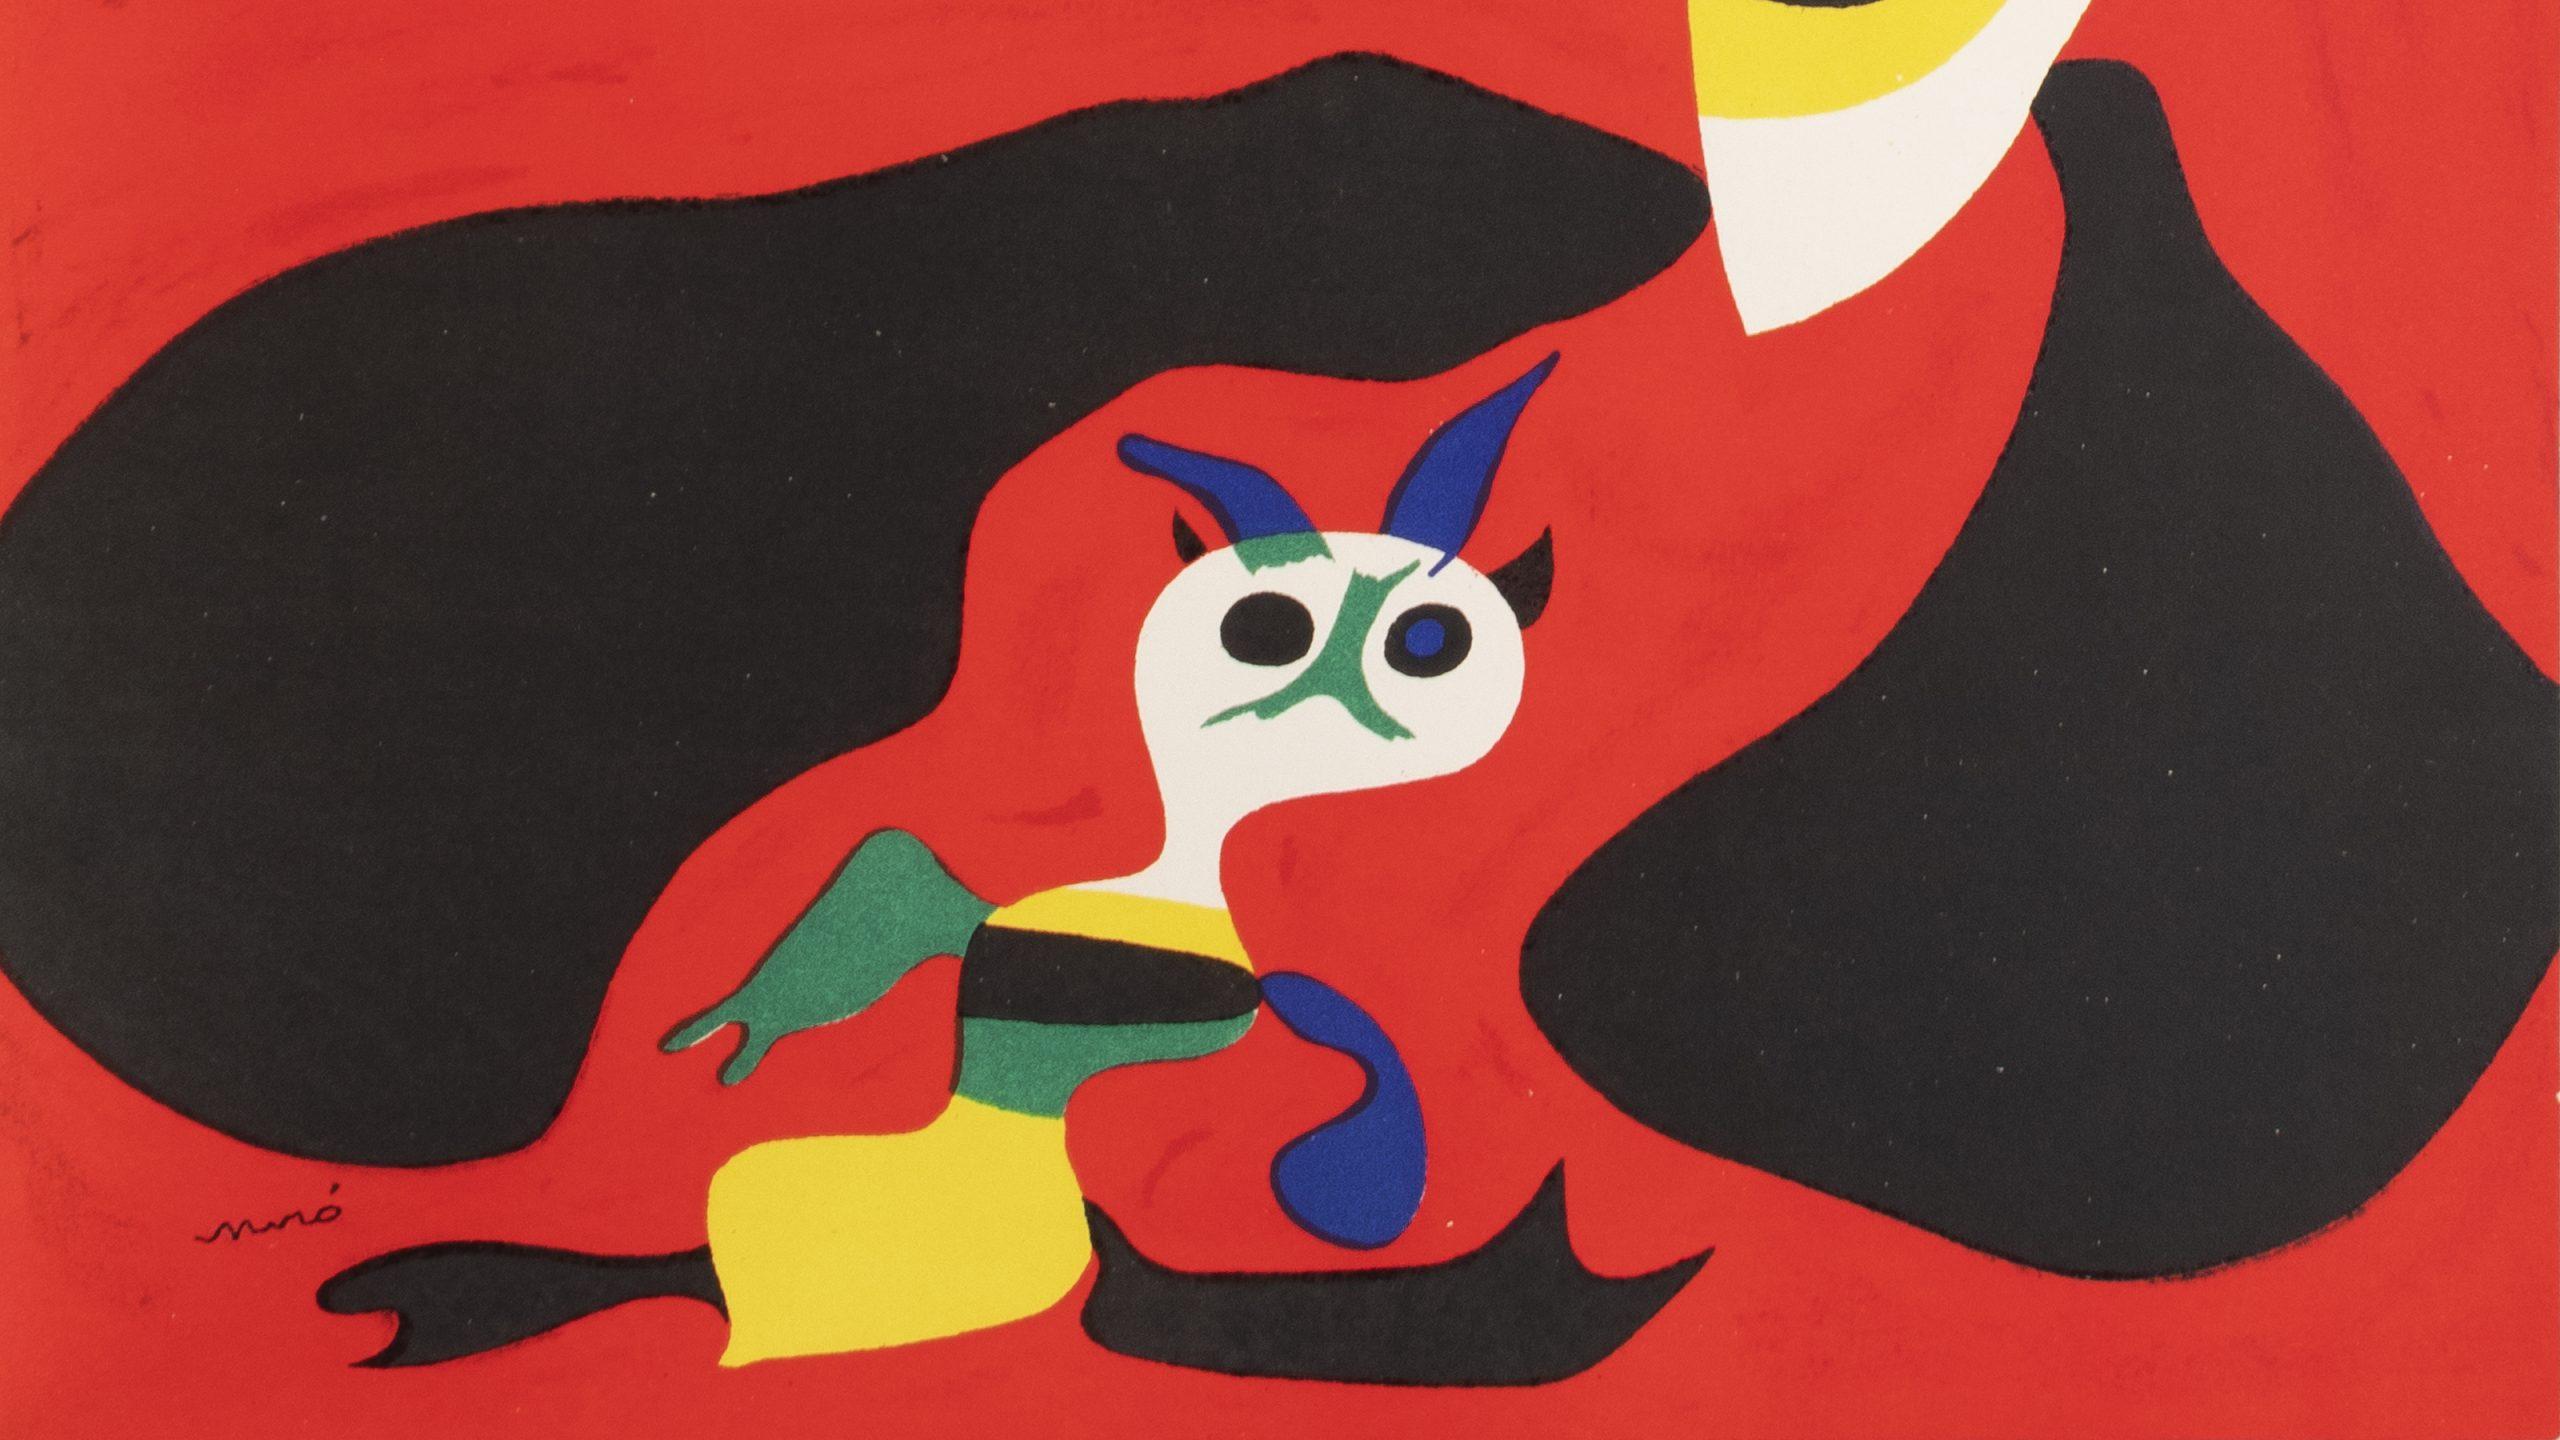 Sale 692: Art & Illustration - Occult & Hermeticism - Fine Books